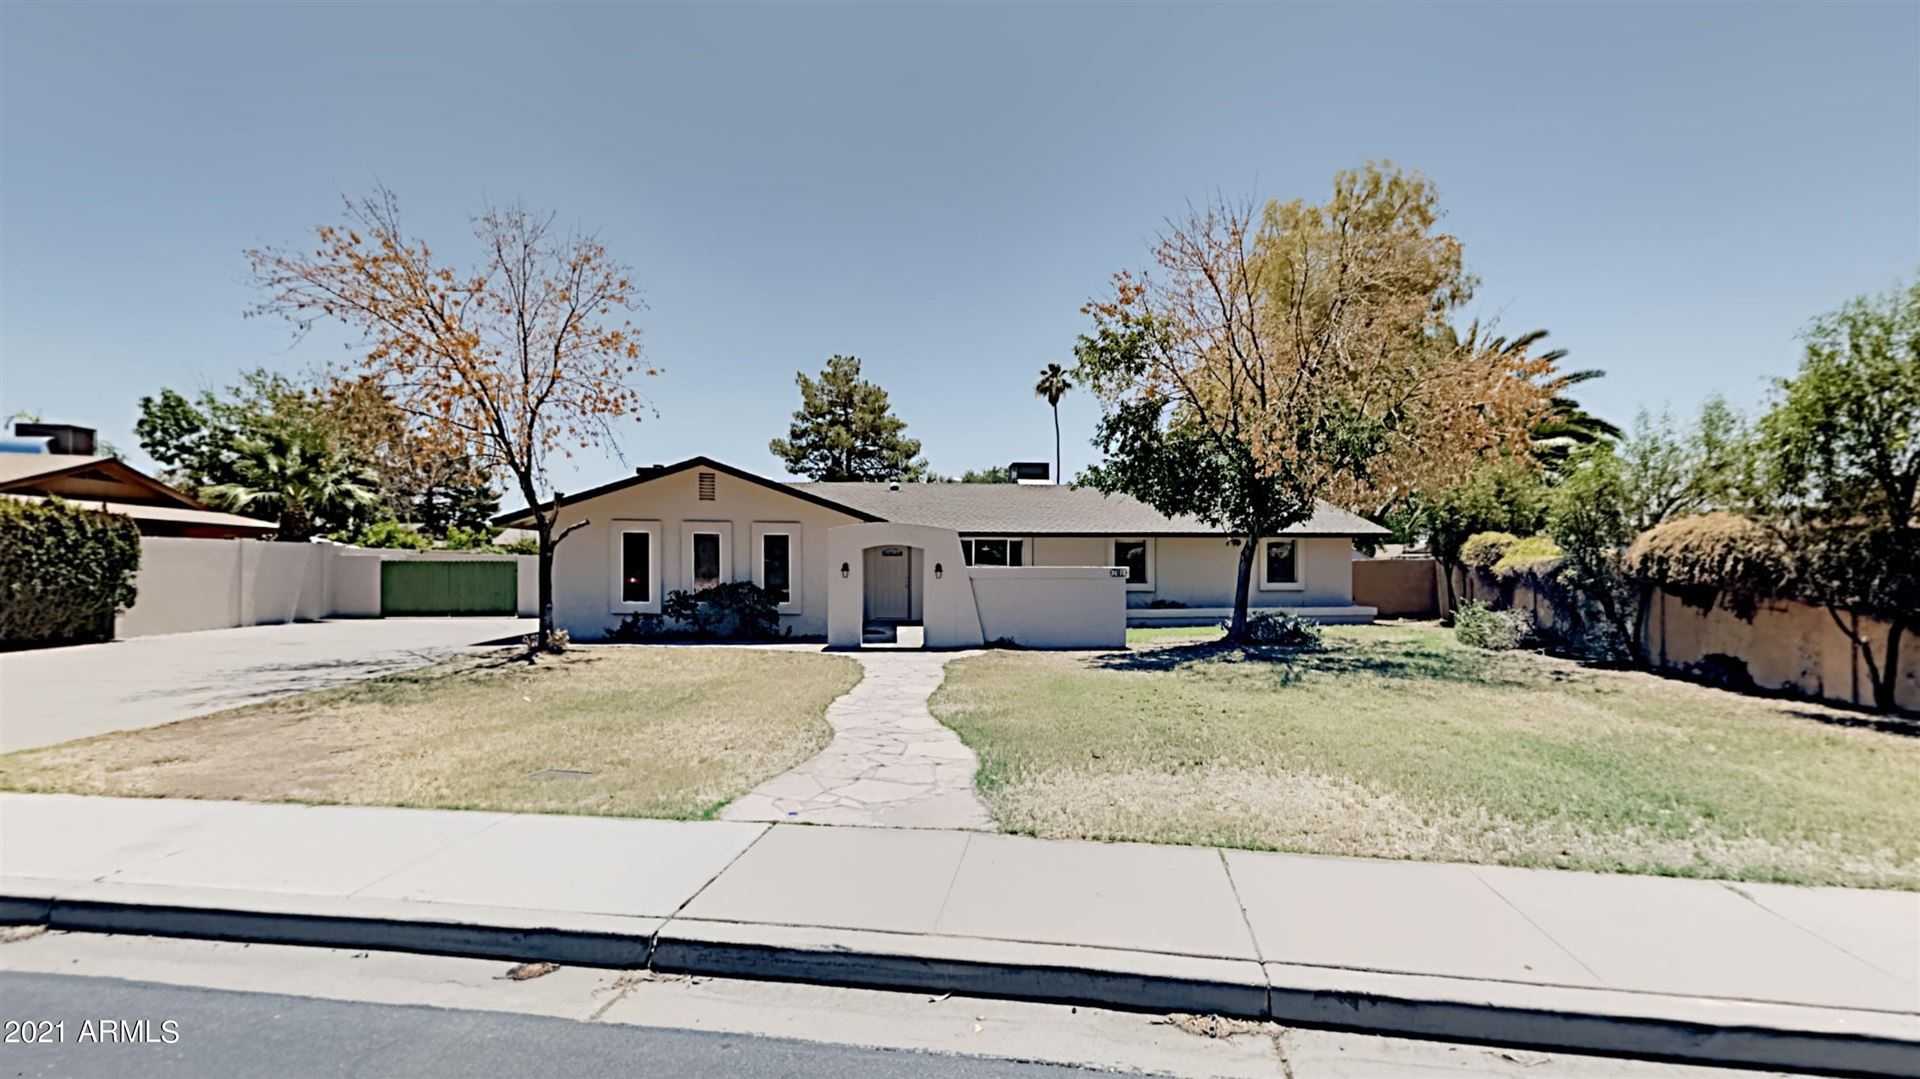 701 N WILLIAMS Street, Mesa, AZ 85203 - #: 6256535